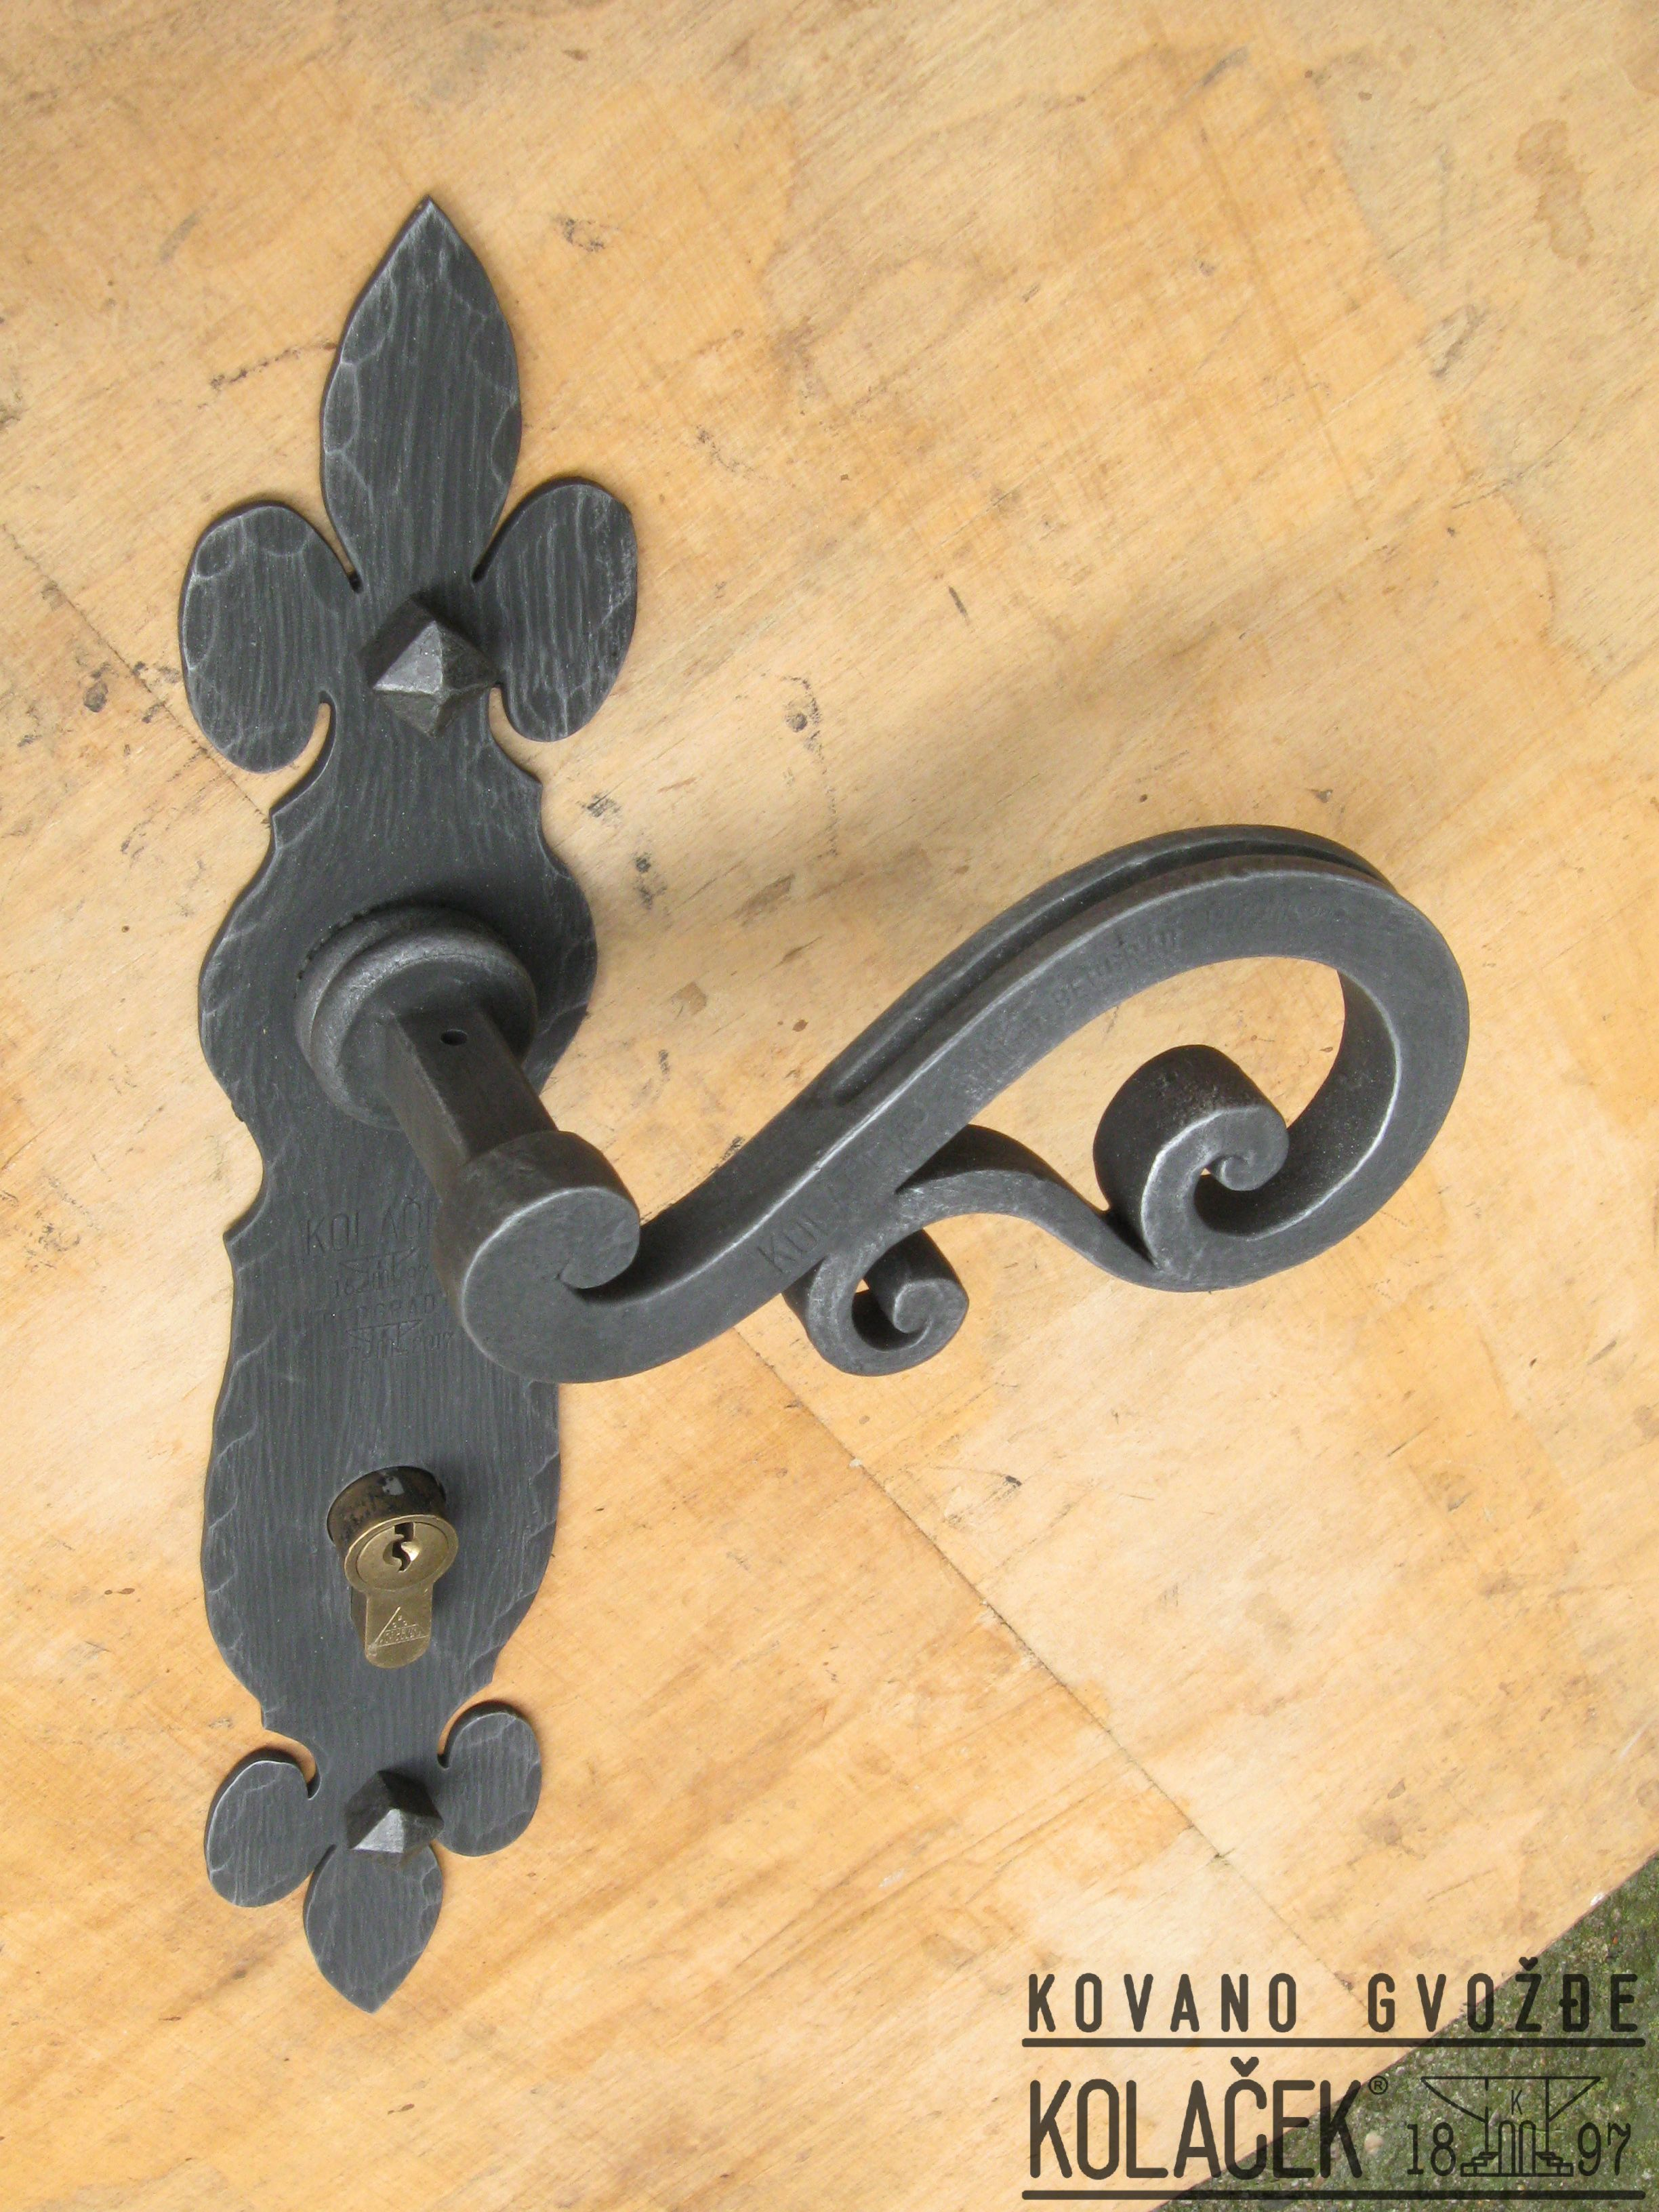 Door handle, wrought iron. Kolacek 1897 | Kovano gvozdje Kolacek ...